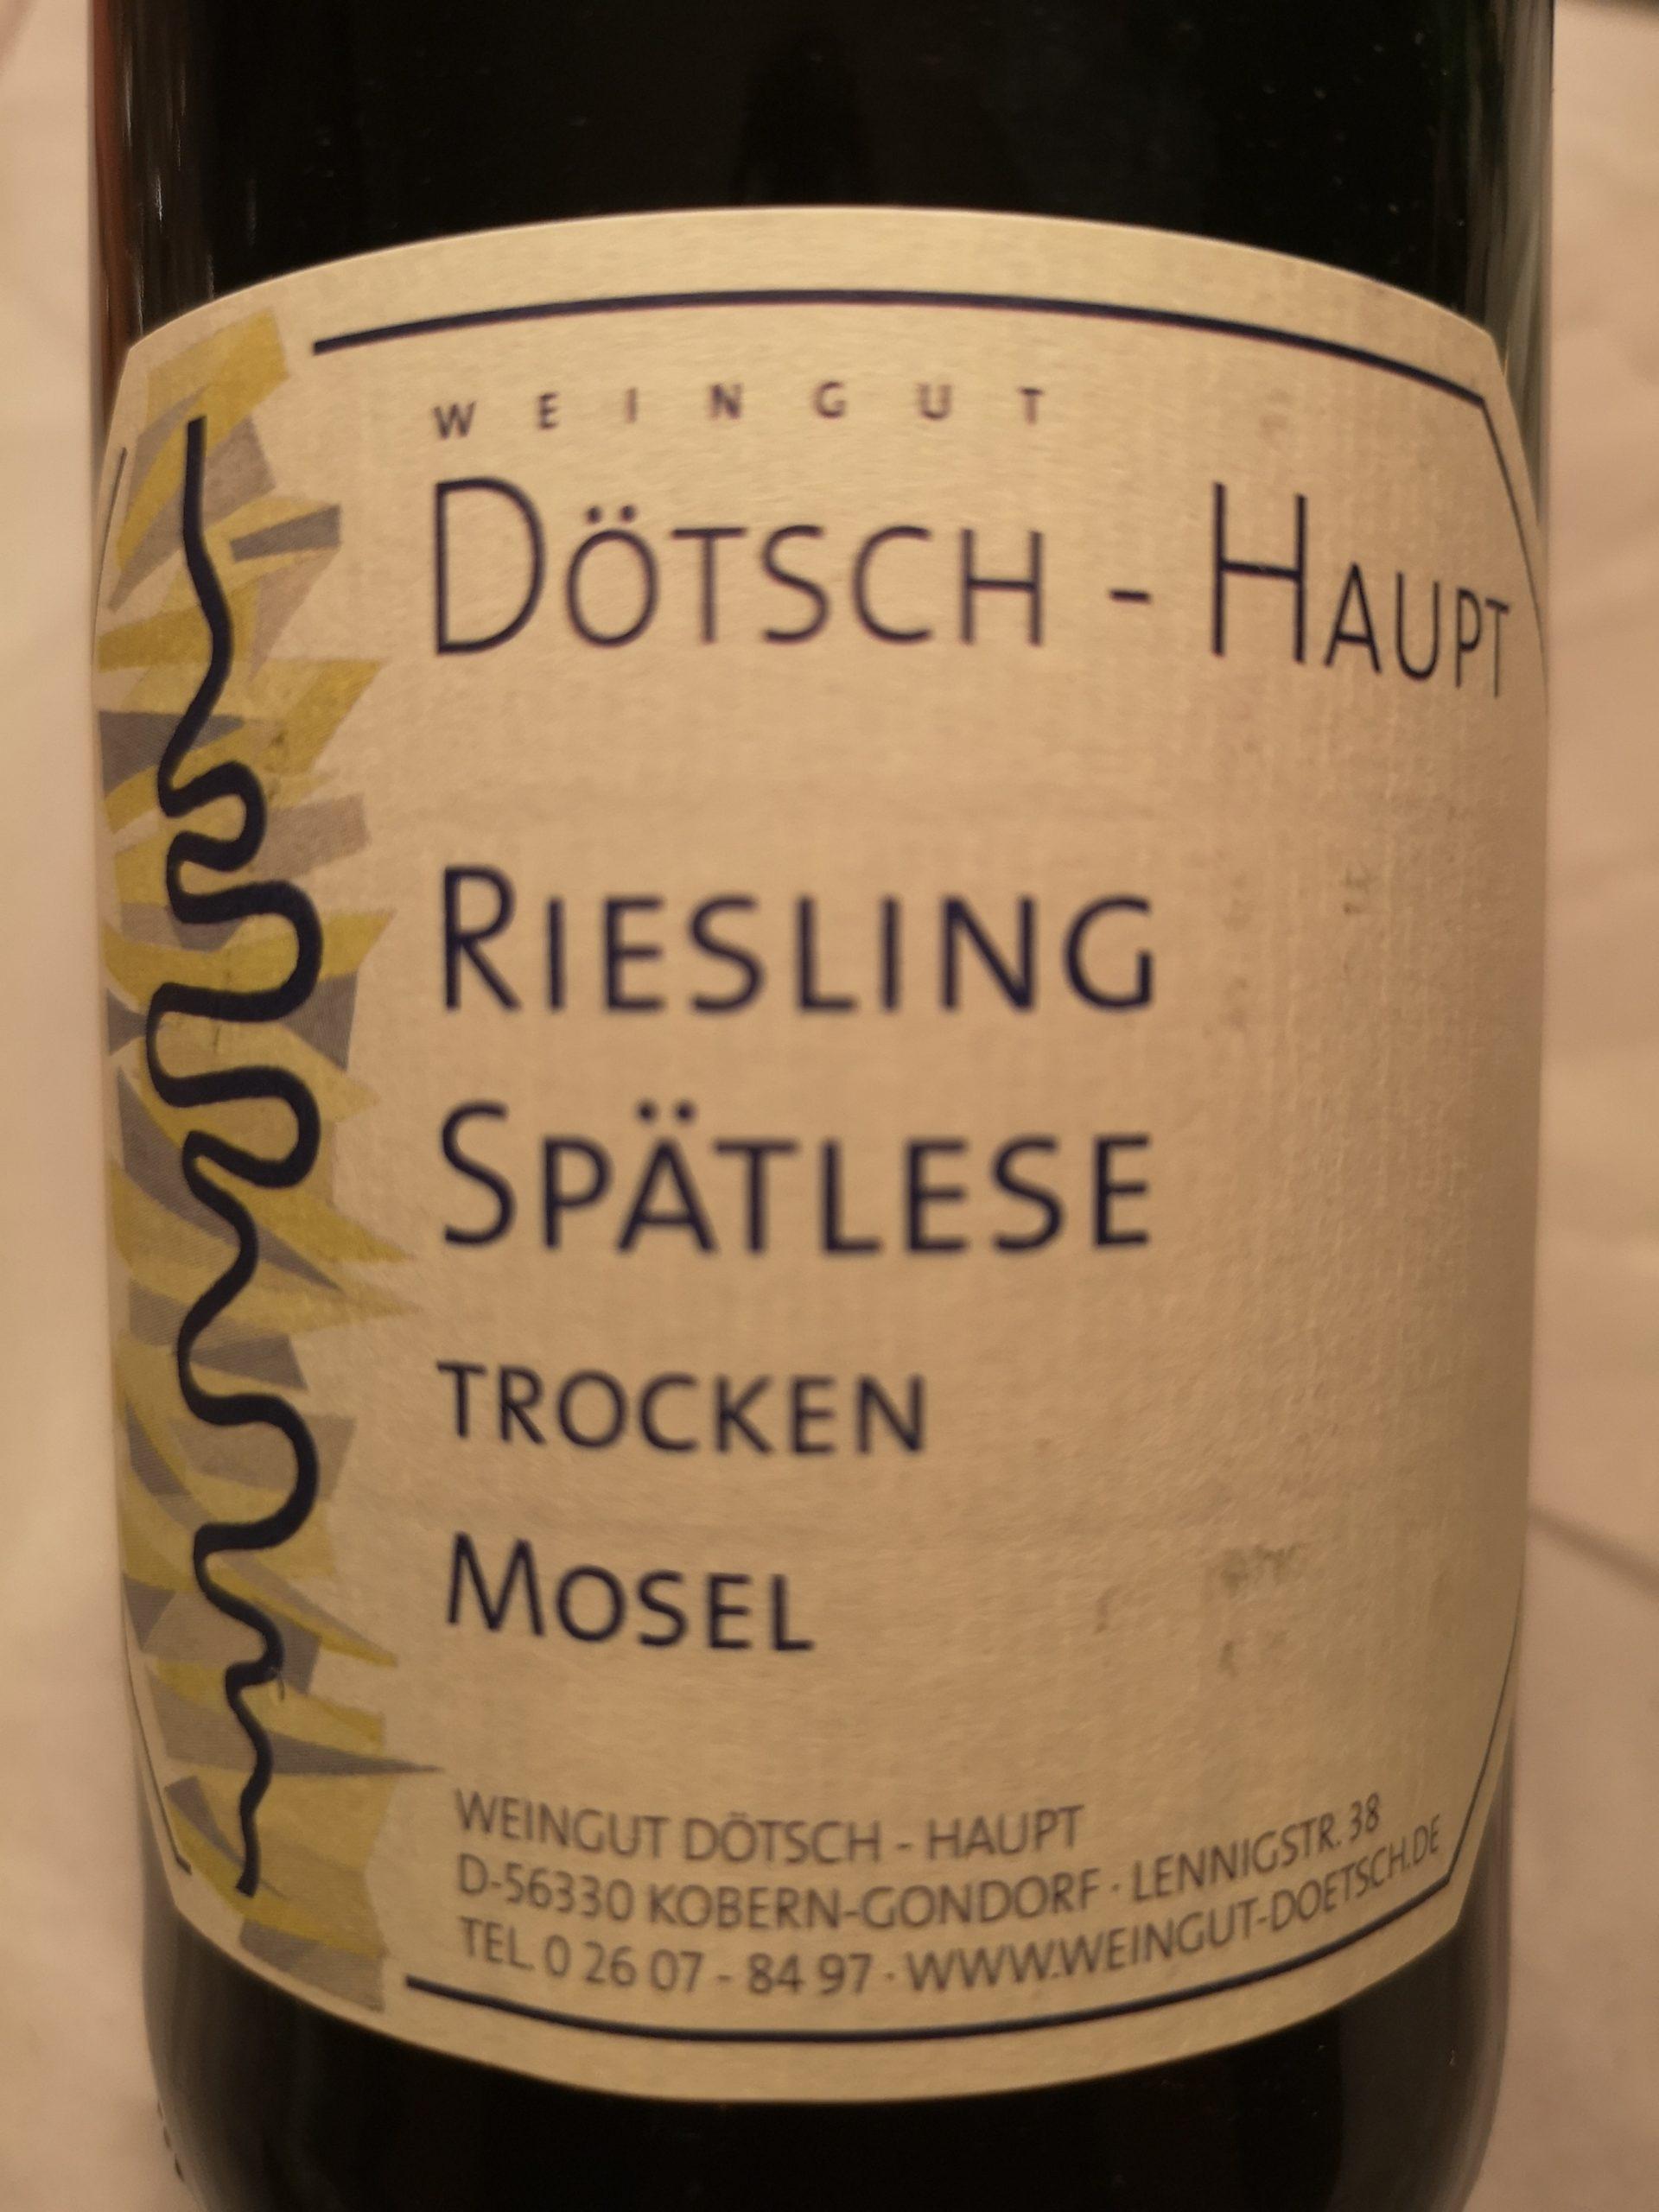 2007 Riesling Spätlese trocken Koberner Uhlen | Dötsch-Haupt